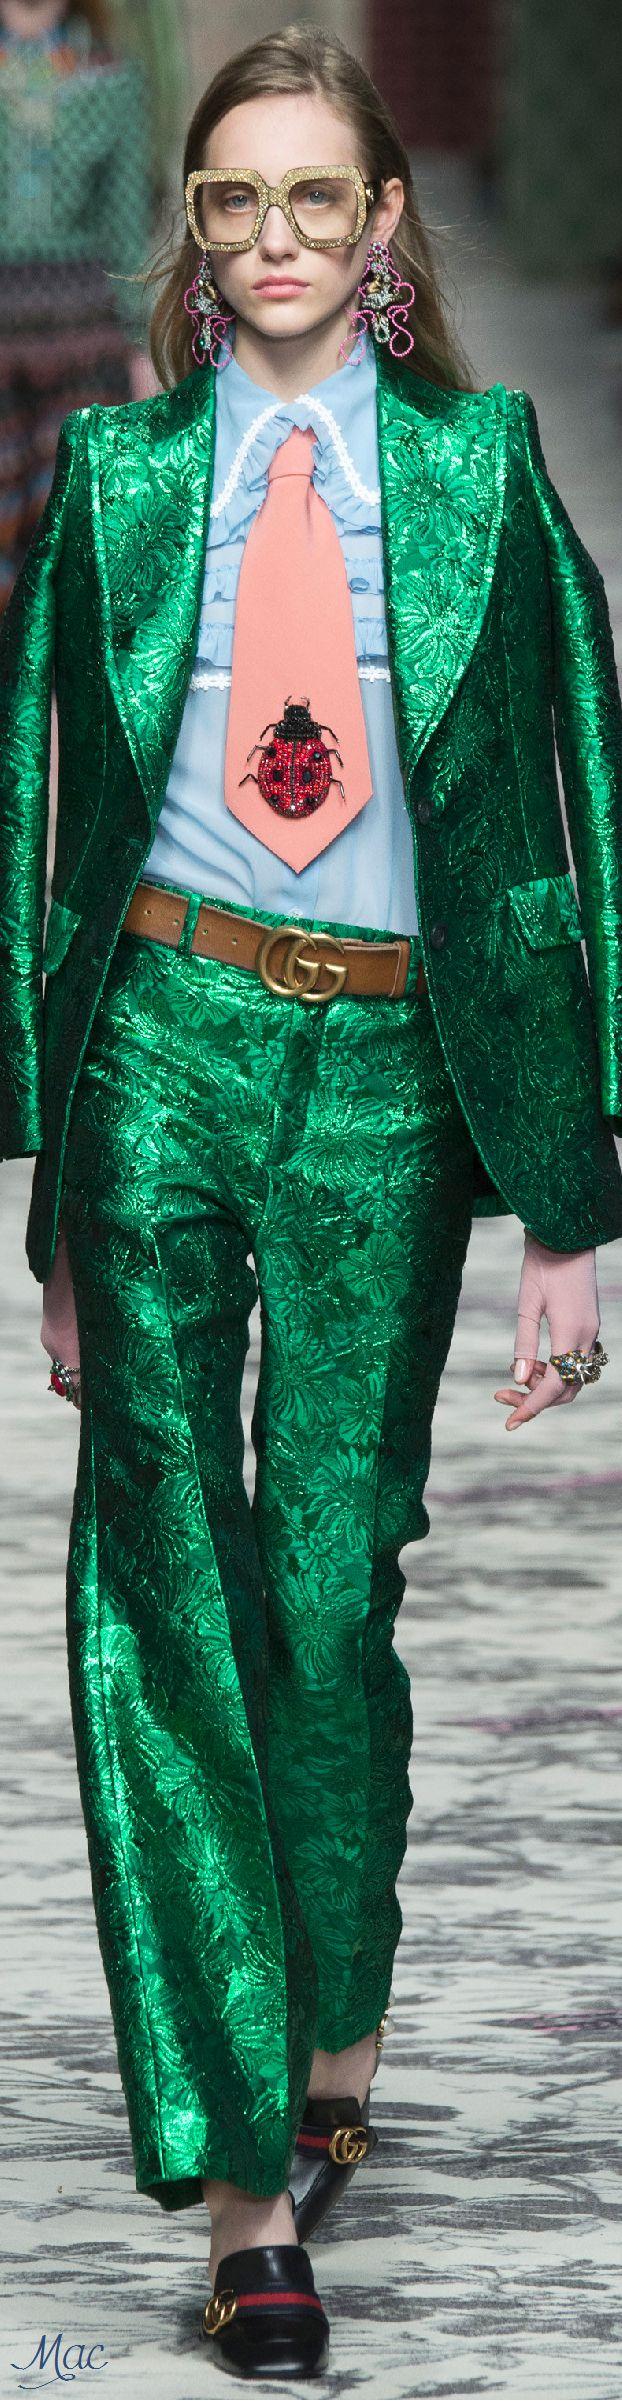 Spring 2016 Ready-to-Wear Gucci it is not nice to make fun of sir Elton john